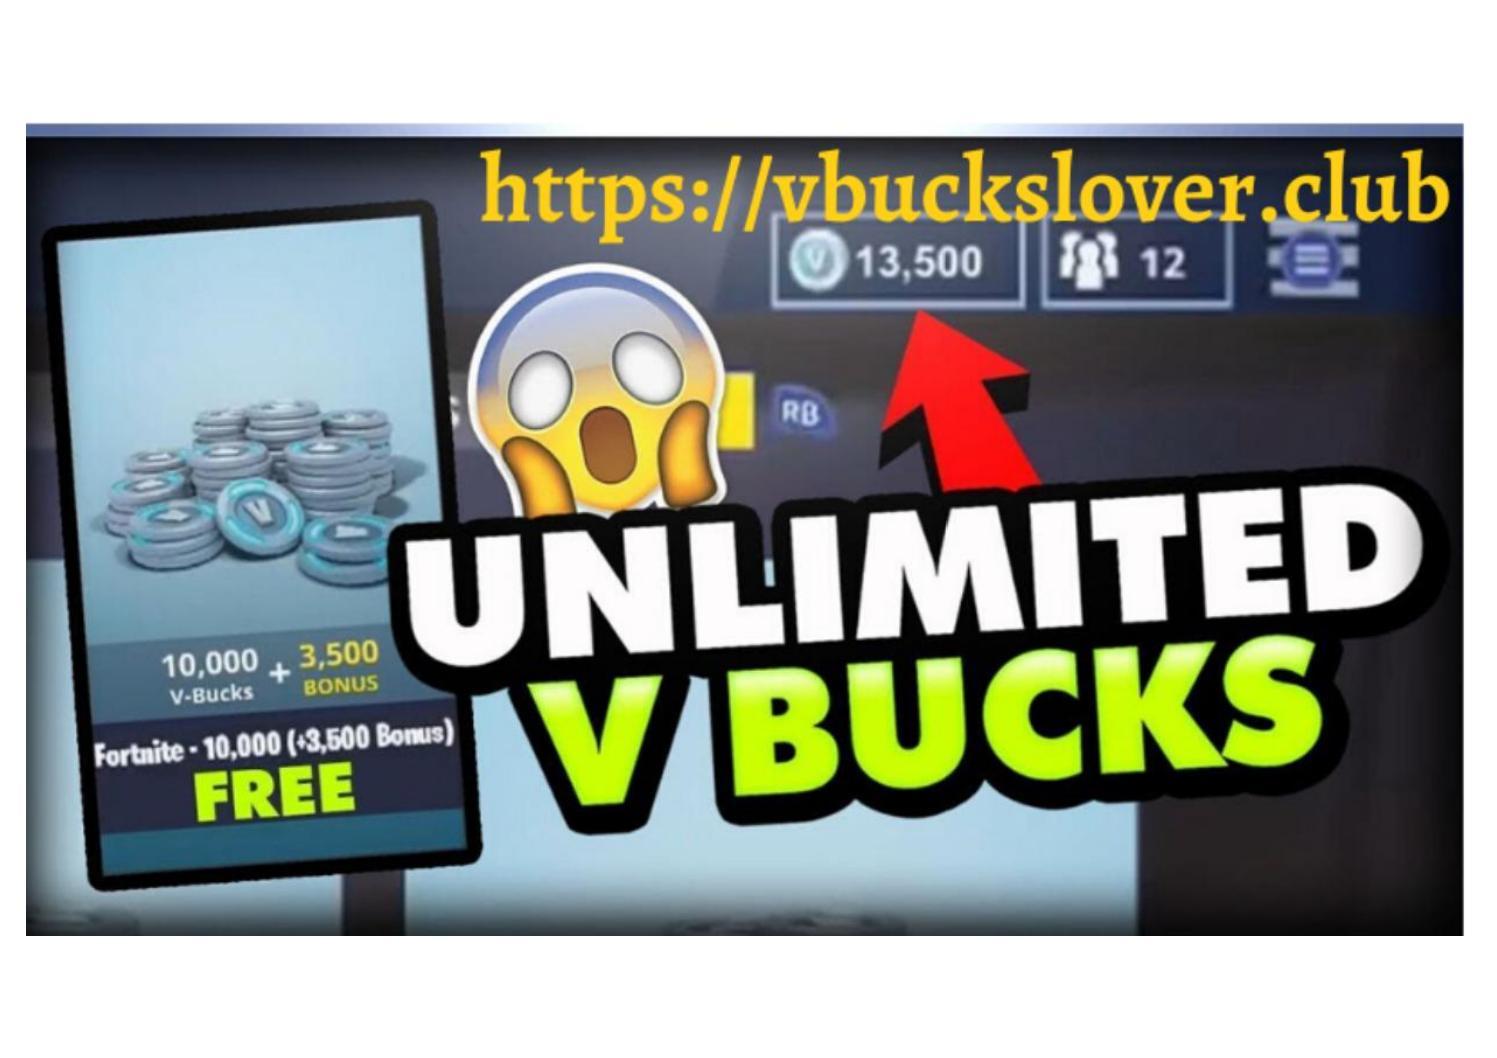 Freev Bucks Generator Lets Play Fortnite Free V Bucks Generator 2020 F O R T N I T E By Marialewiss007 Issuu